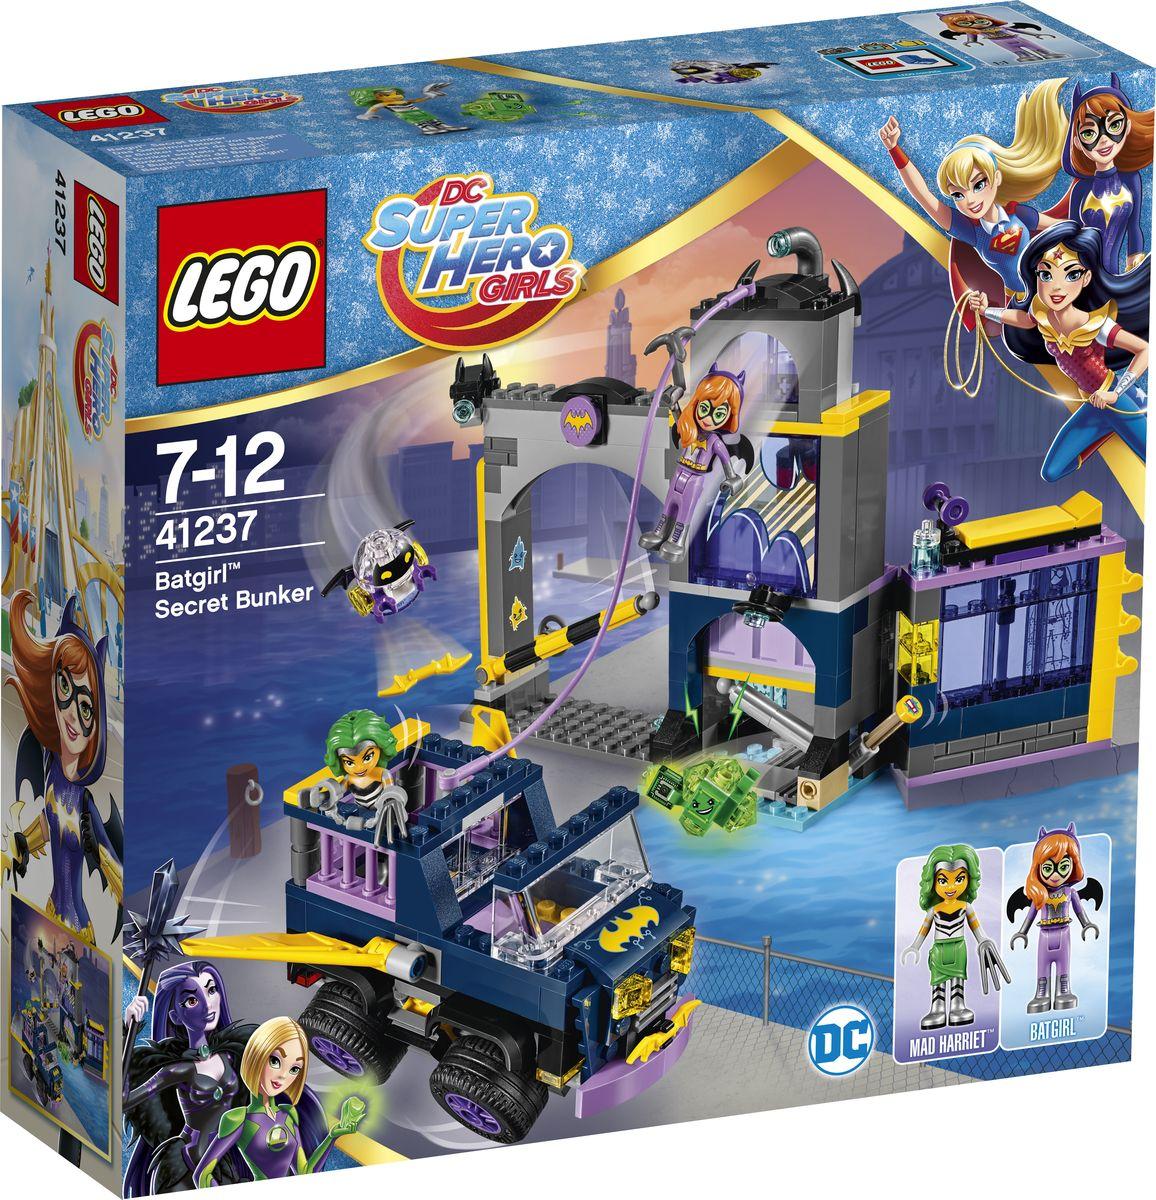 LEGO DC Super Hero Girls Конструктор Секретный бункер Бэтгерл 41237 секретный бункер бэтгёрл 41237 dc super hero girls lego